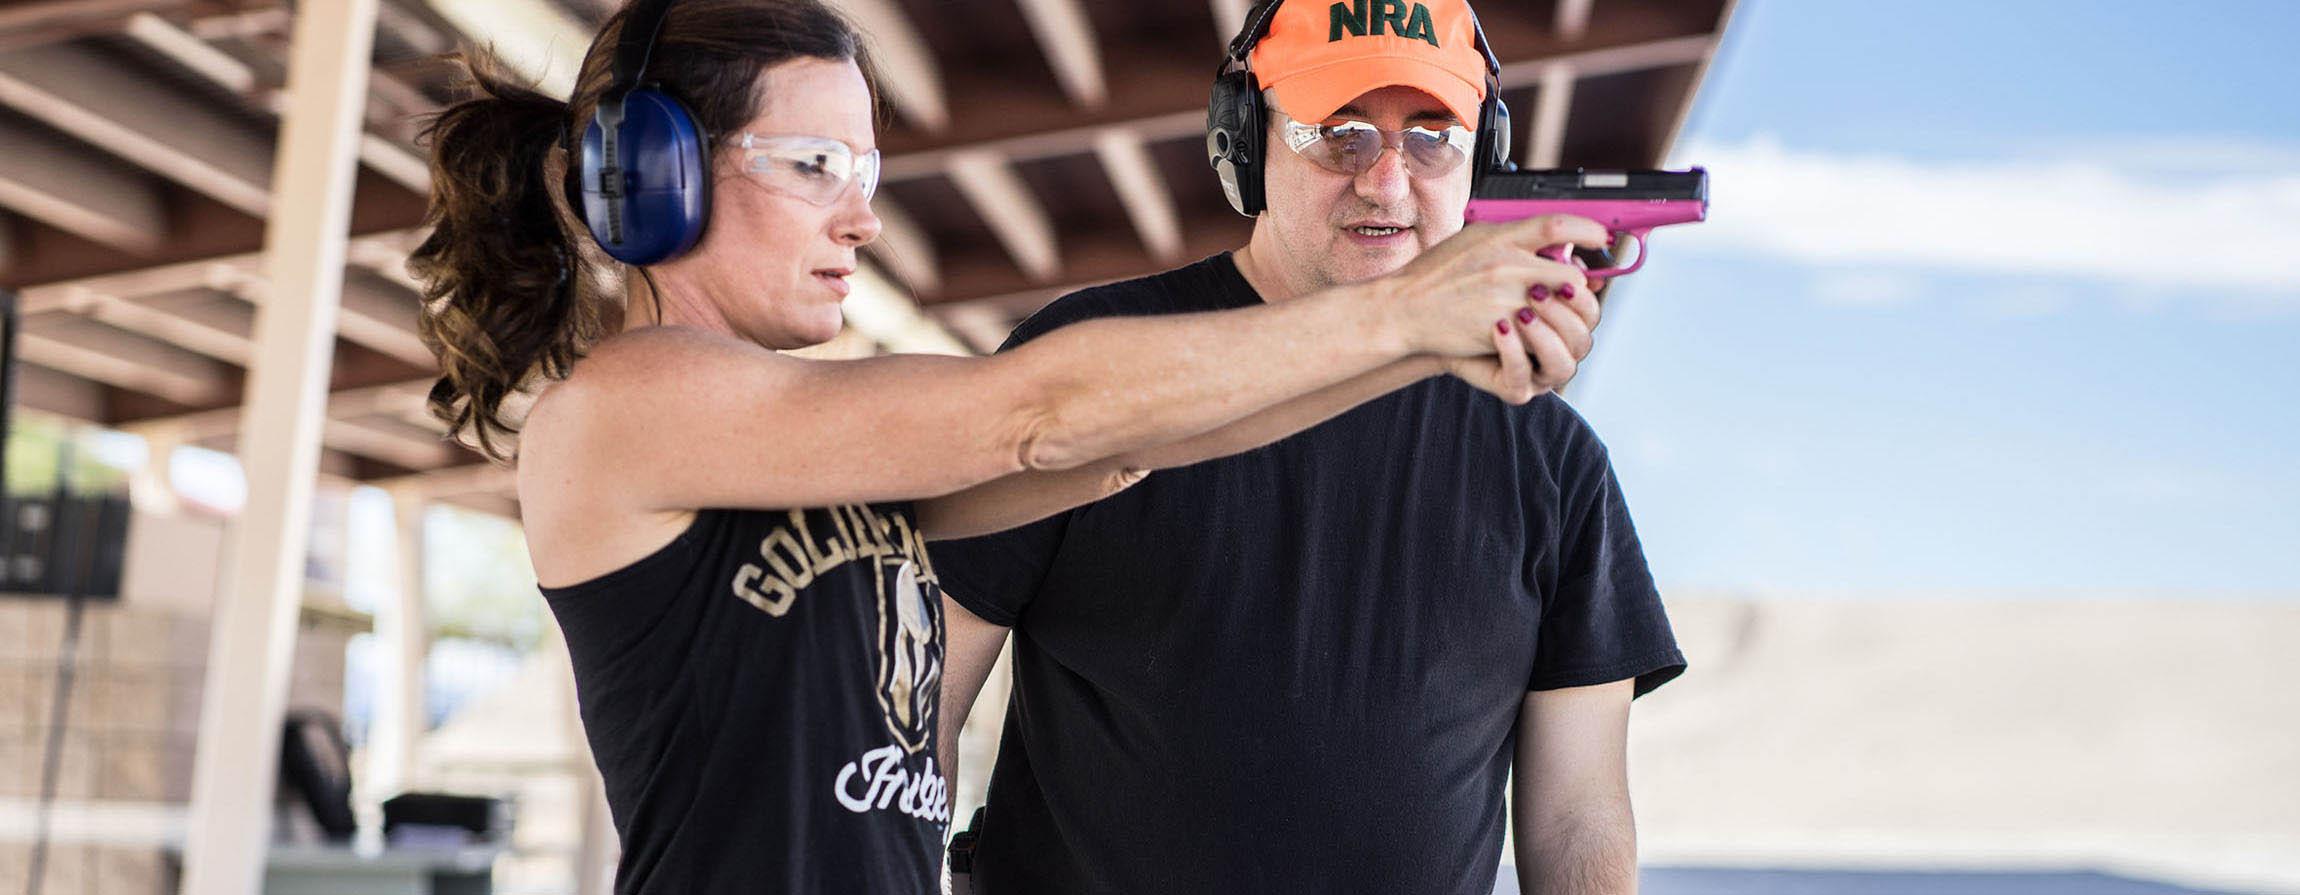 ccw gun school Las Vegas fundamentals